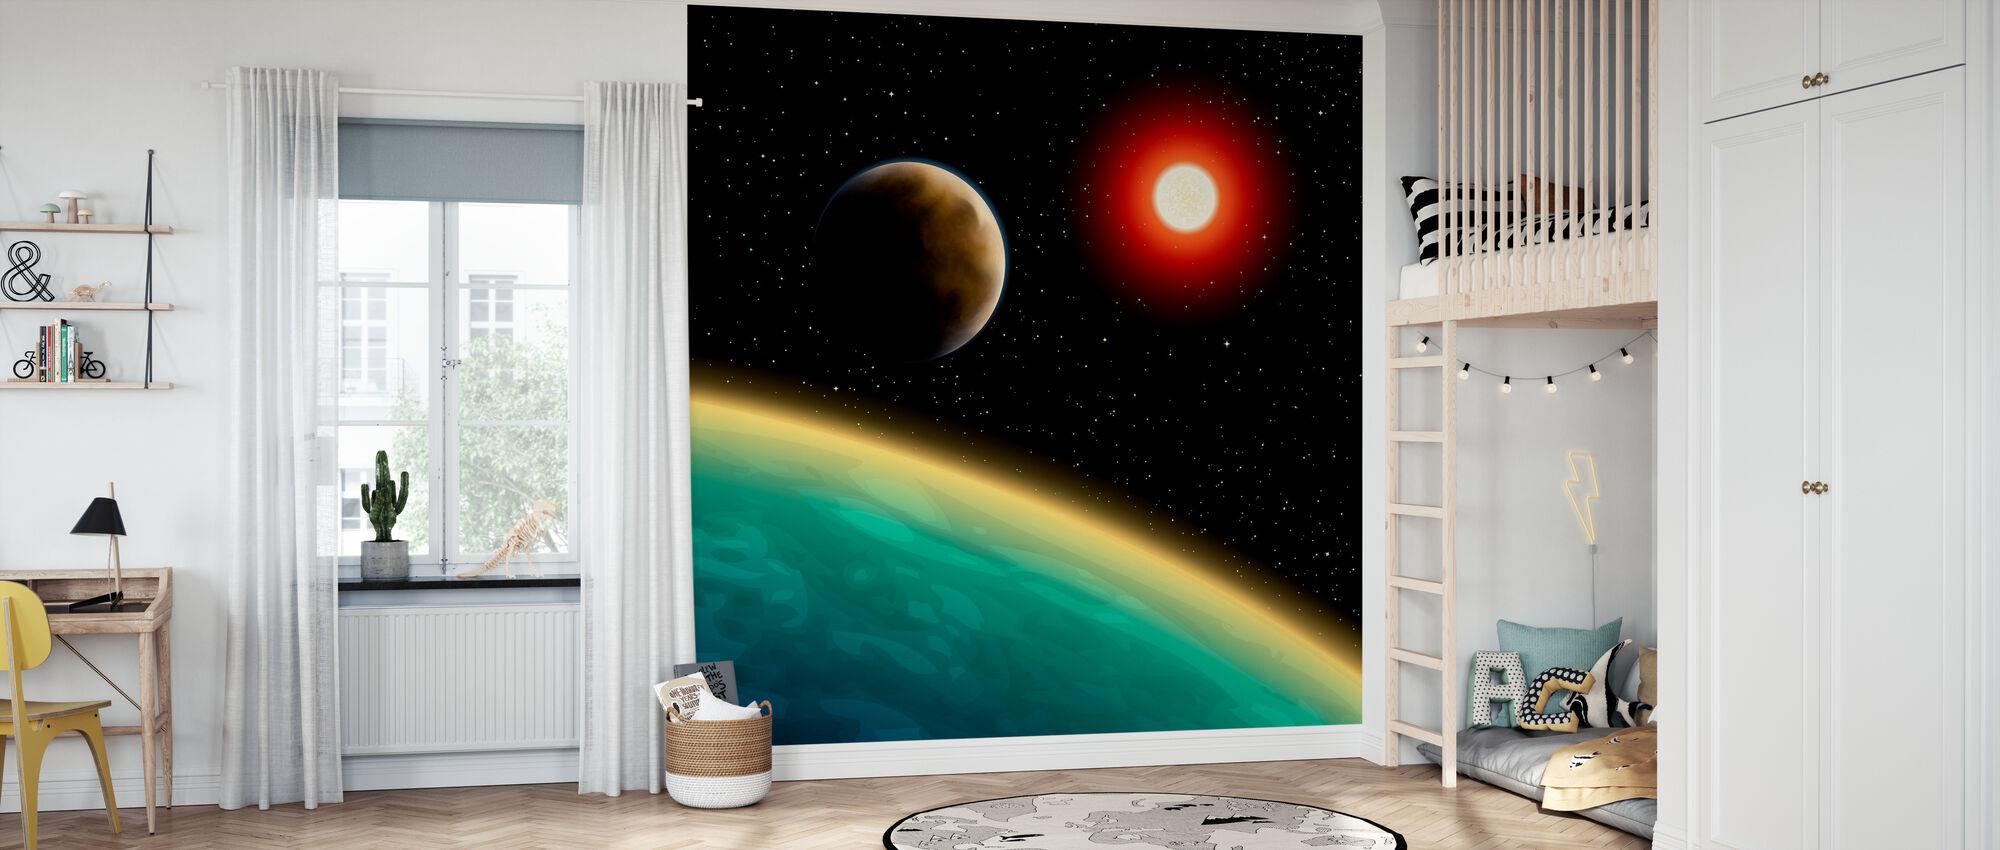 Starry Cosmos - Wallpaper - Kids Room